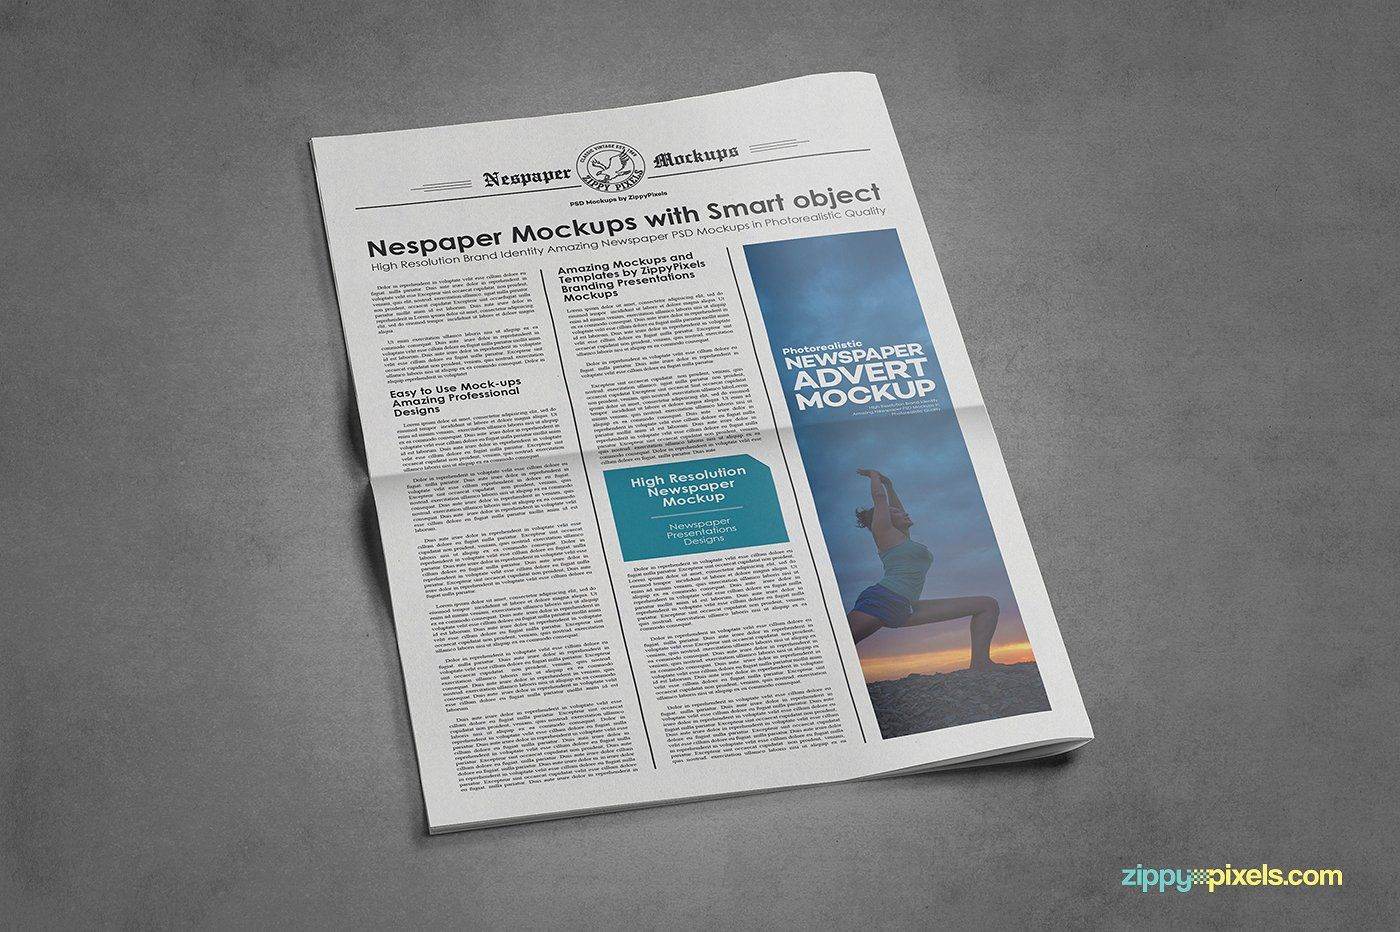 Tabloid Size Newspaper Mockups Vol 8 Newspaper Graphic Design Resume Newspaper Design